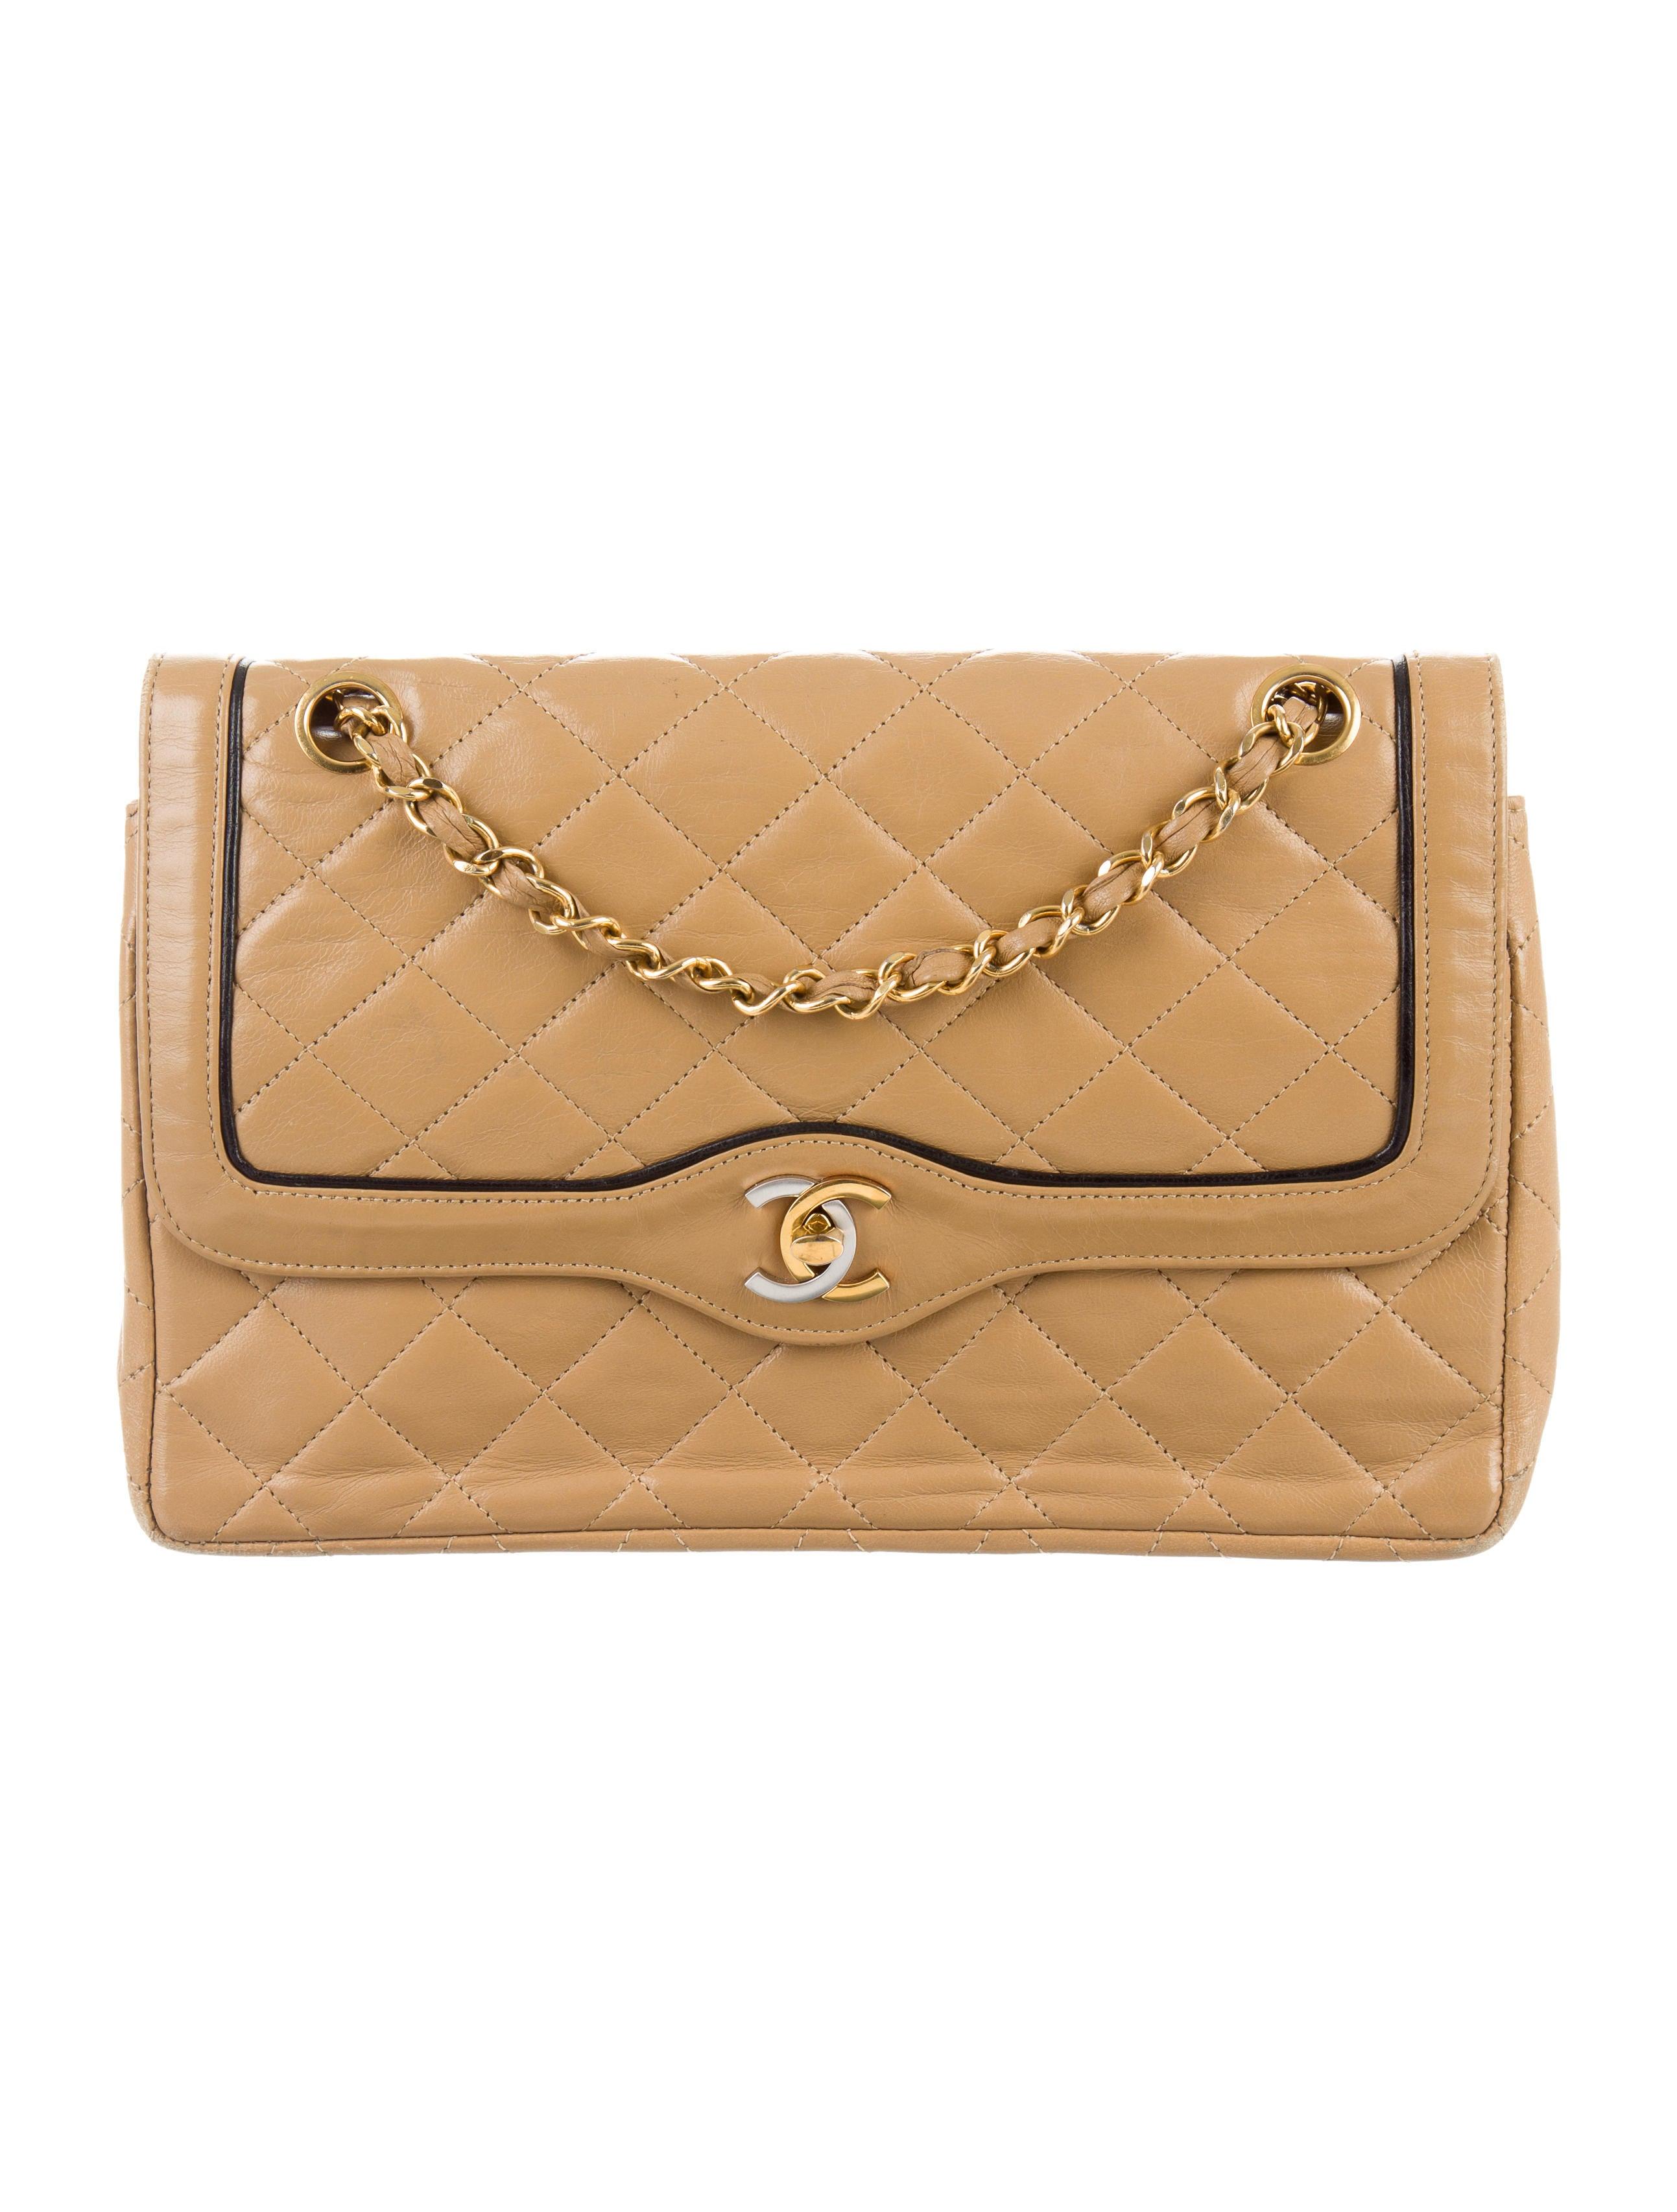 Chanel Väskor Vintage : Chanel vintage flap bag handbags cha the realreal